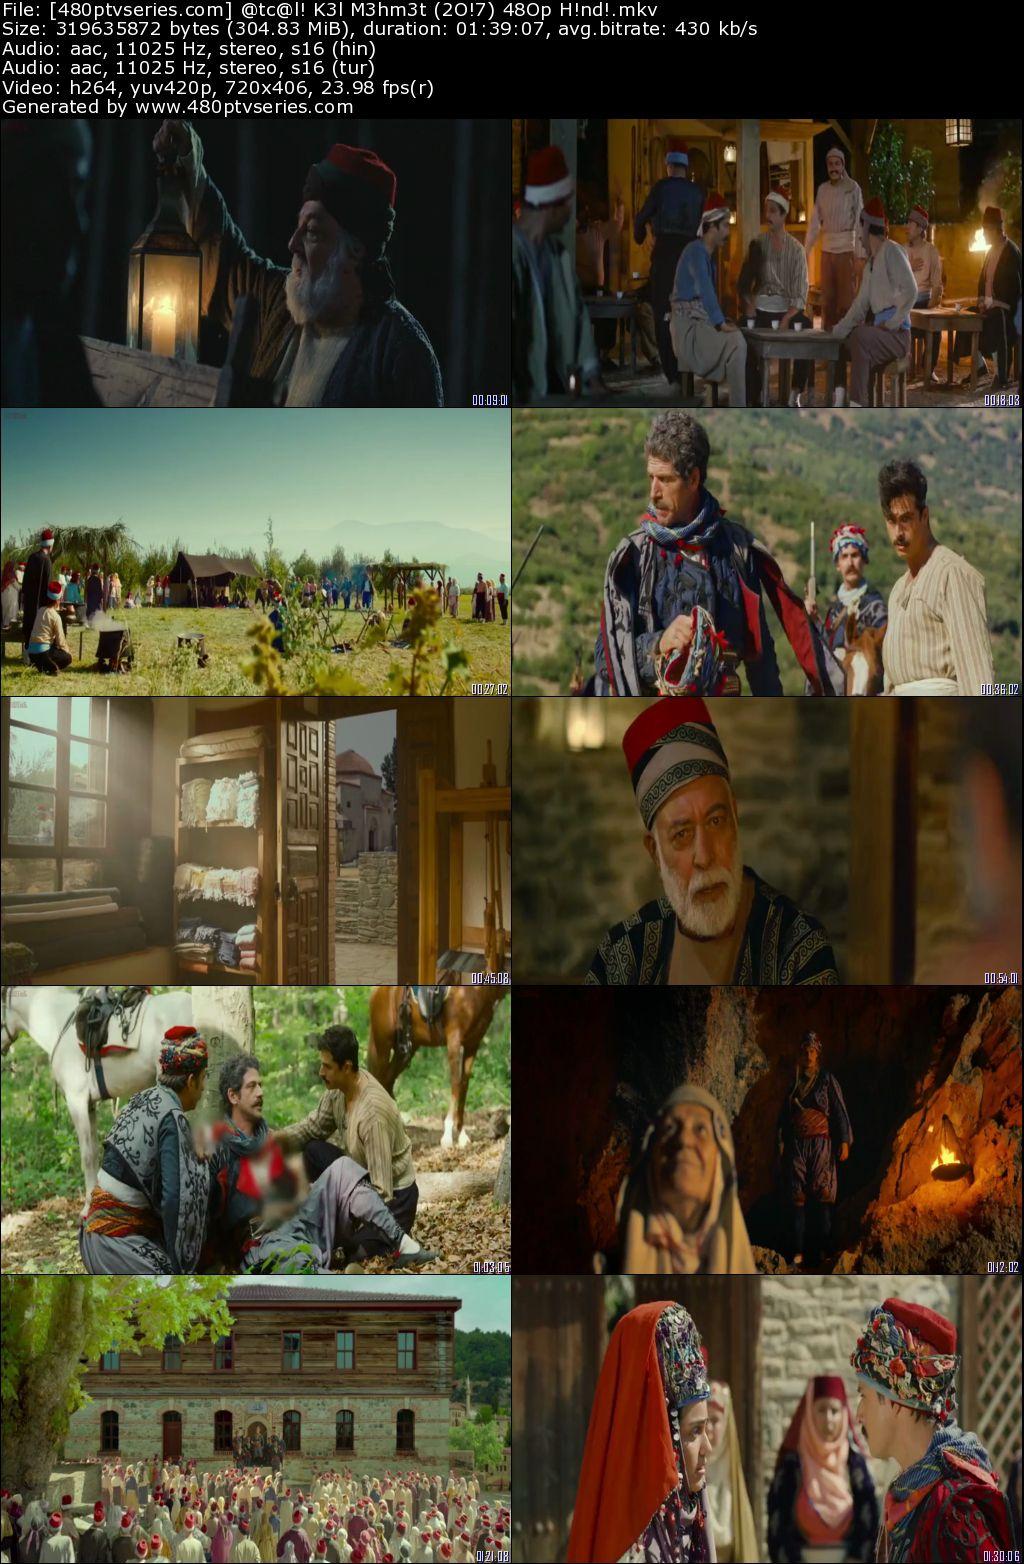 Atçali Kel Mehmet (2017) 300MB Full Hindi Dual Audio Movie Download 480p HDTVRip Free Watch Online Full Movie Download Worldfree4u 9xmovies